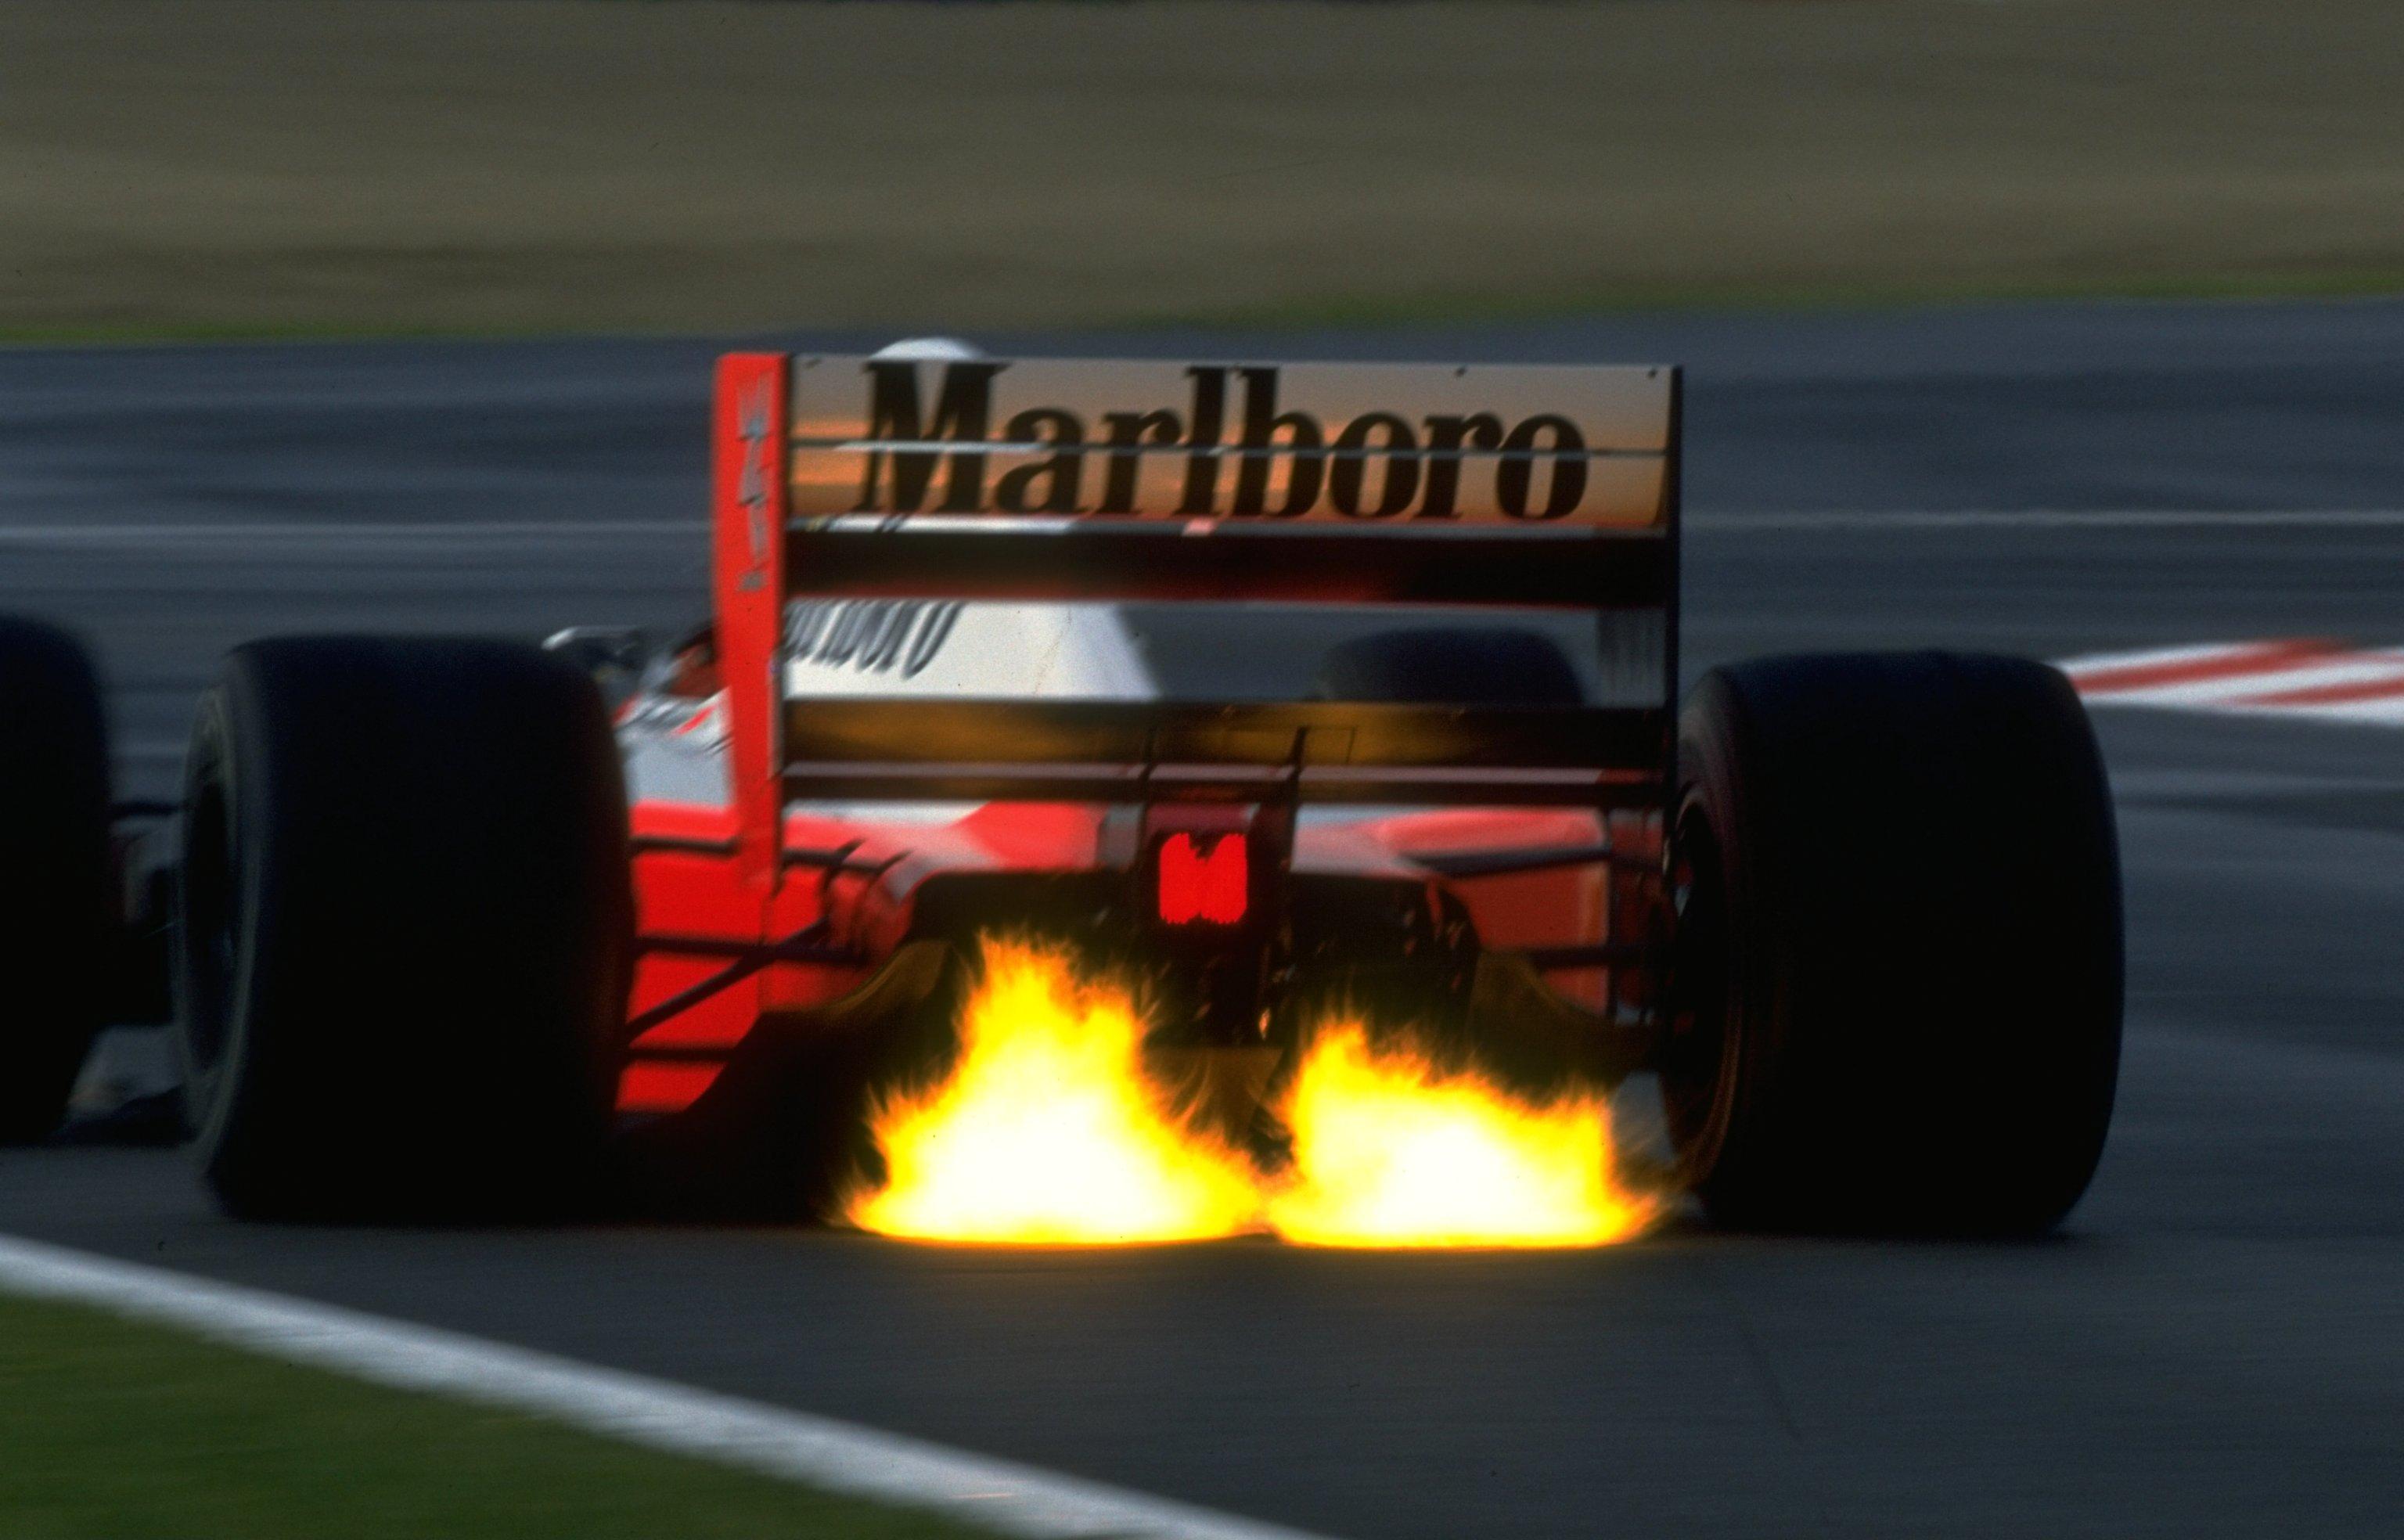 General 3072x1968 Ayrton Senna McLaren Formula 1 vehicle race cars racing sports sport  fire formula cars backfire exaust flare motorsports